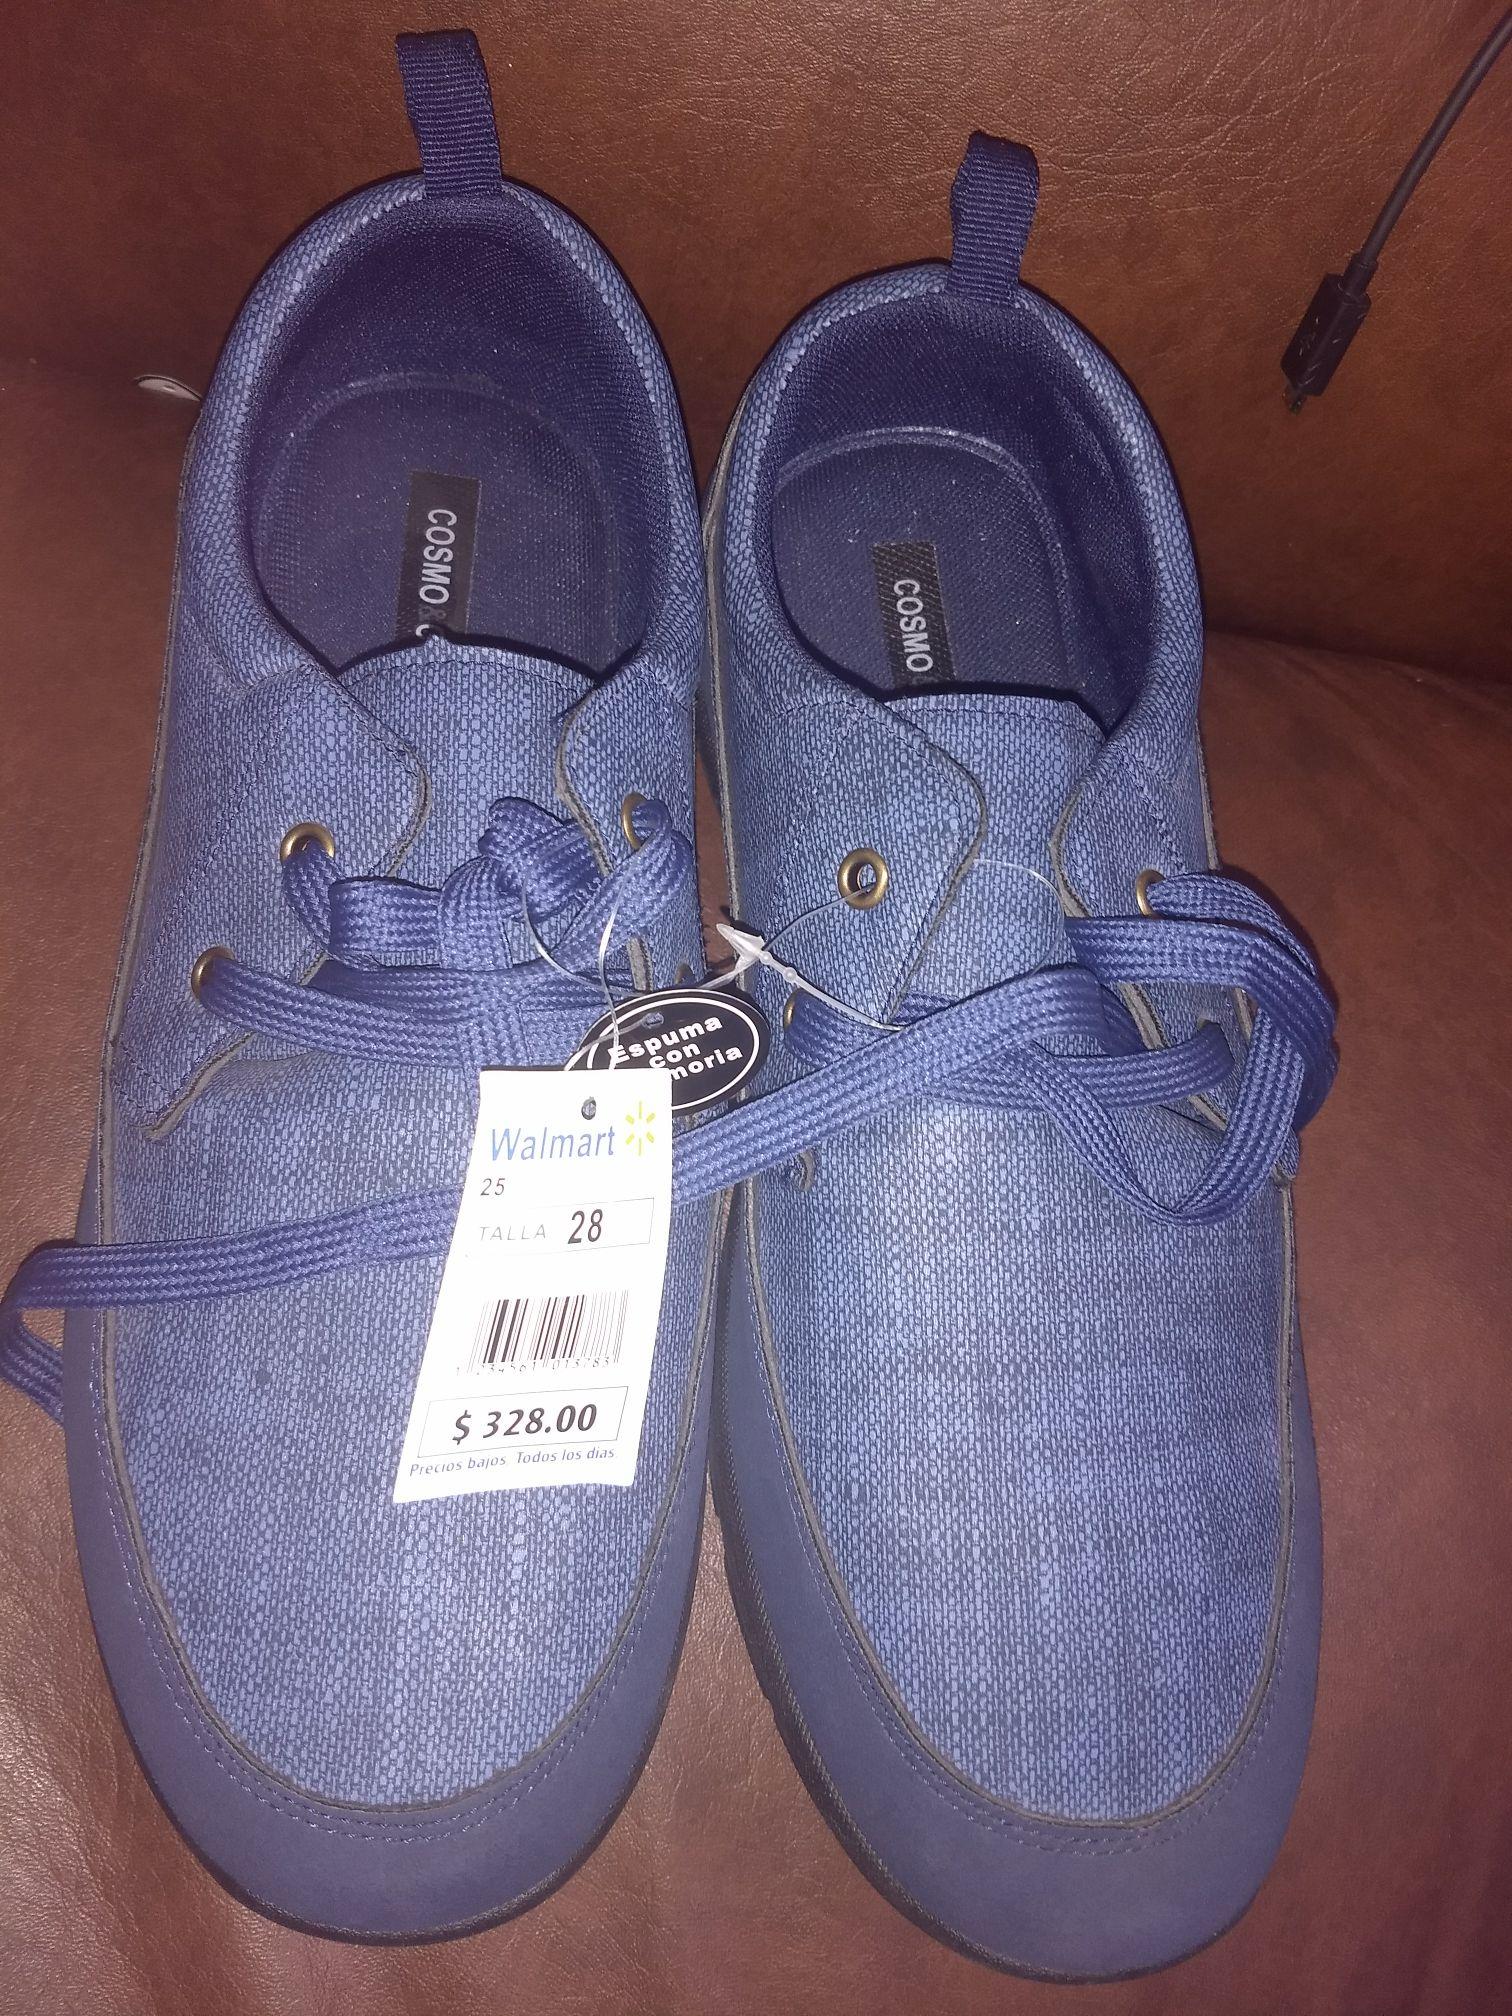 Walmart: zapatos azules